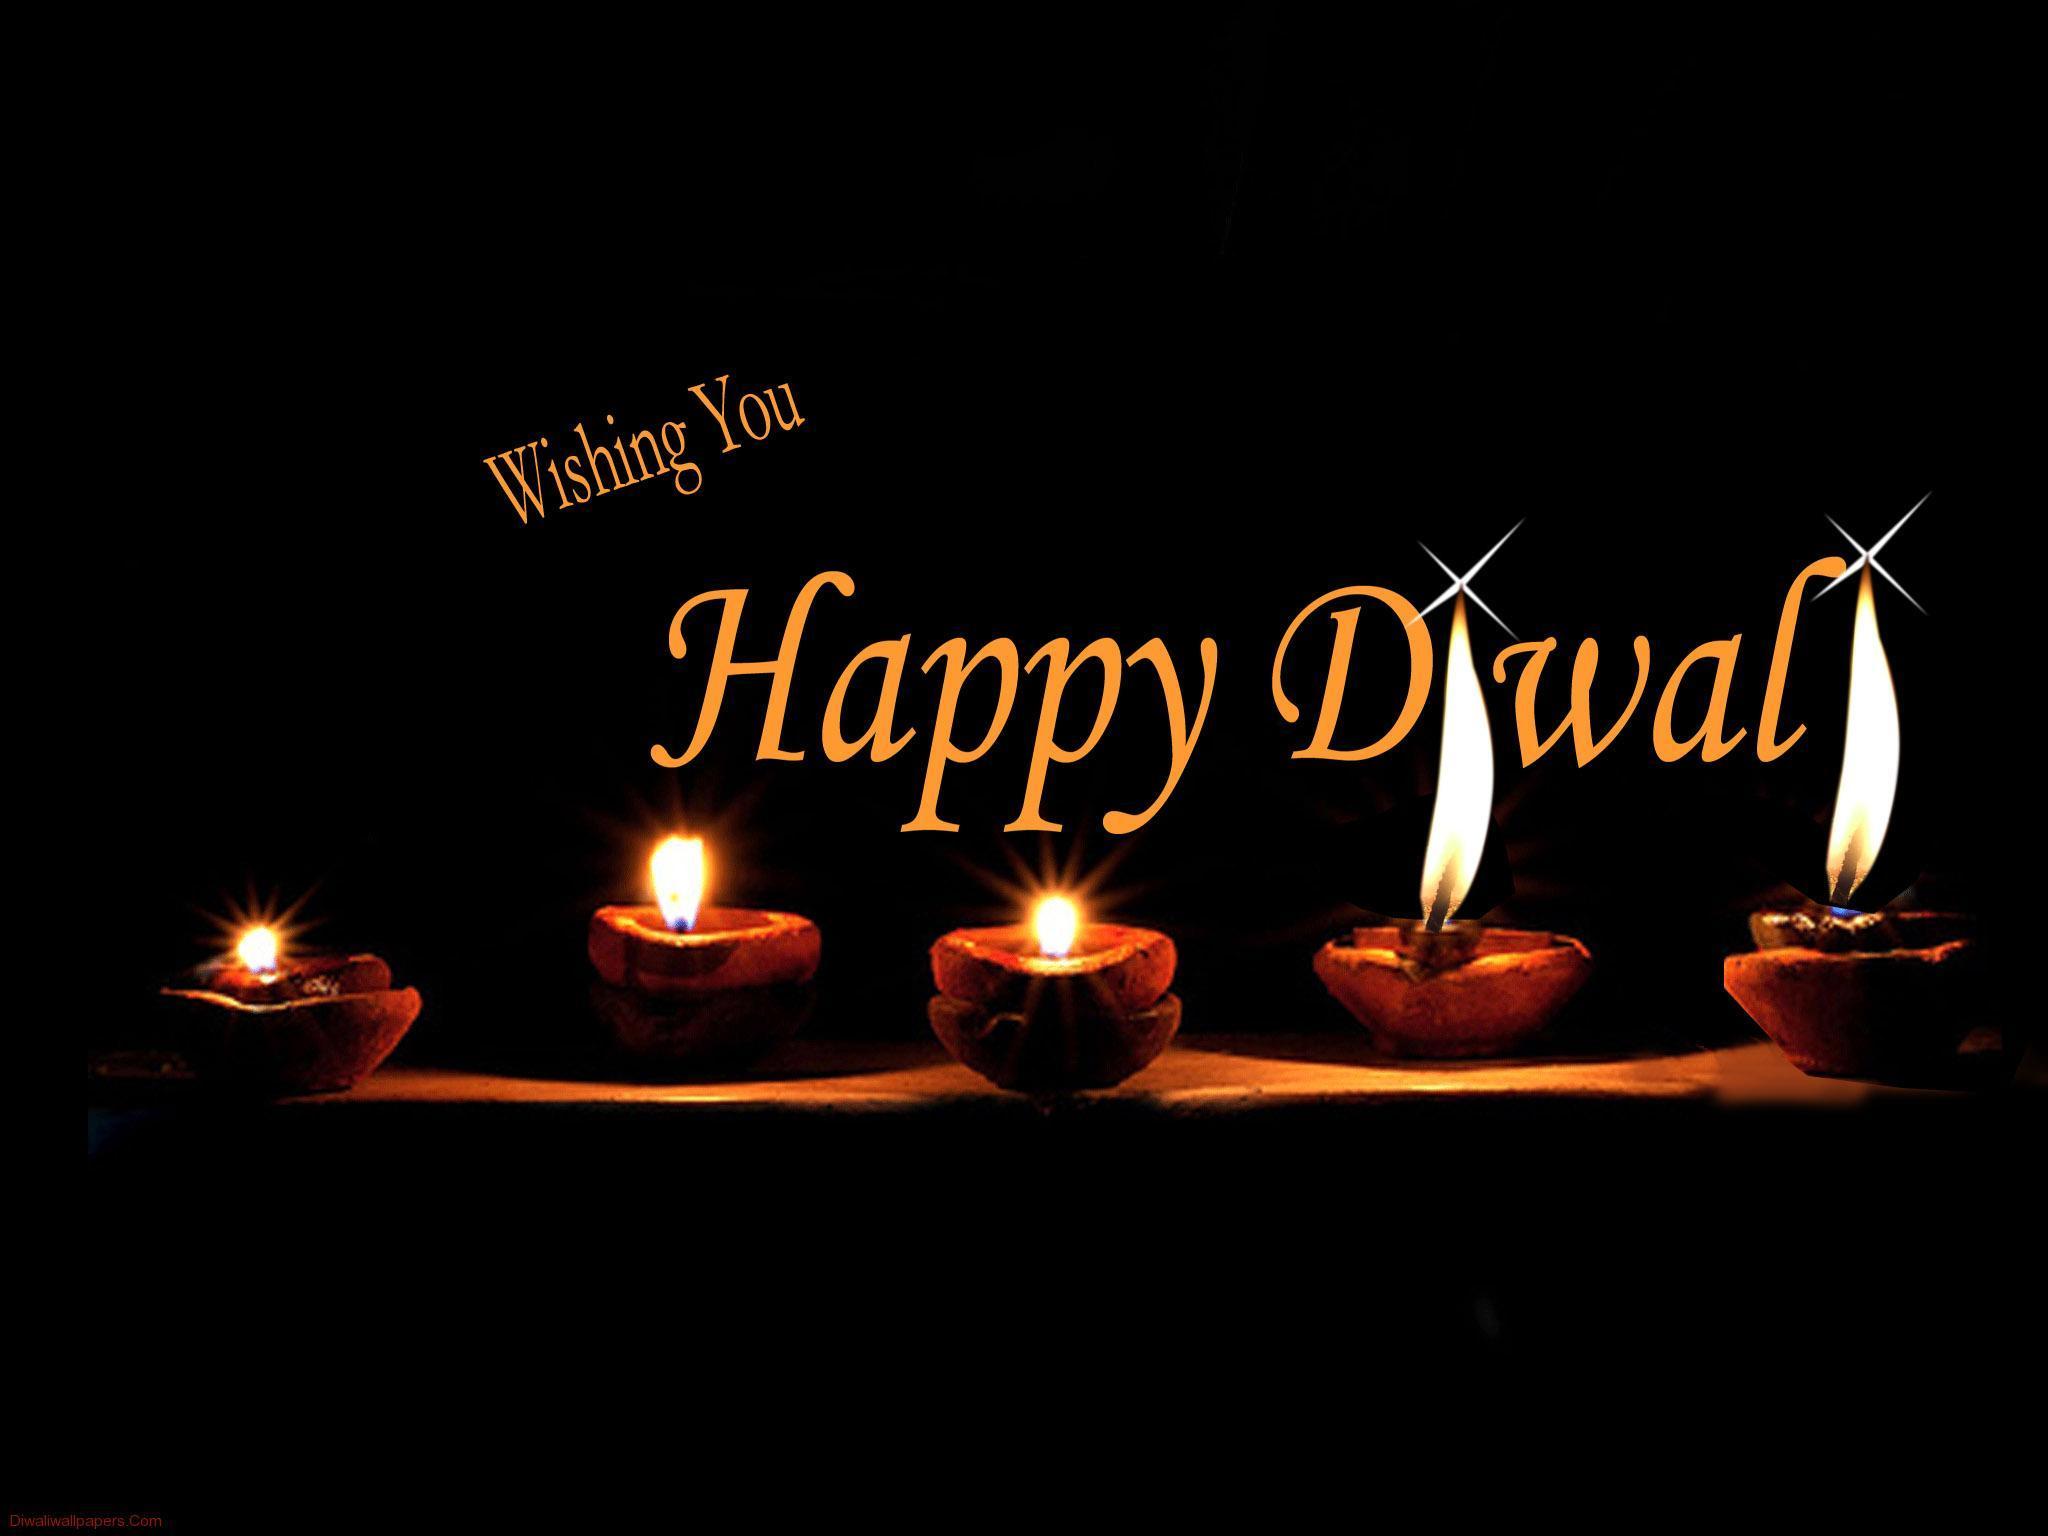 Animated happy diwali greetings hd great animated happy diwali gallery of chotti diwali greetings cards with animated happy diwali greetings hd m4hsunfo